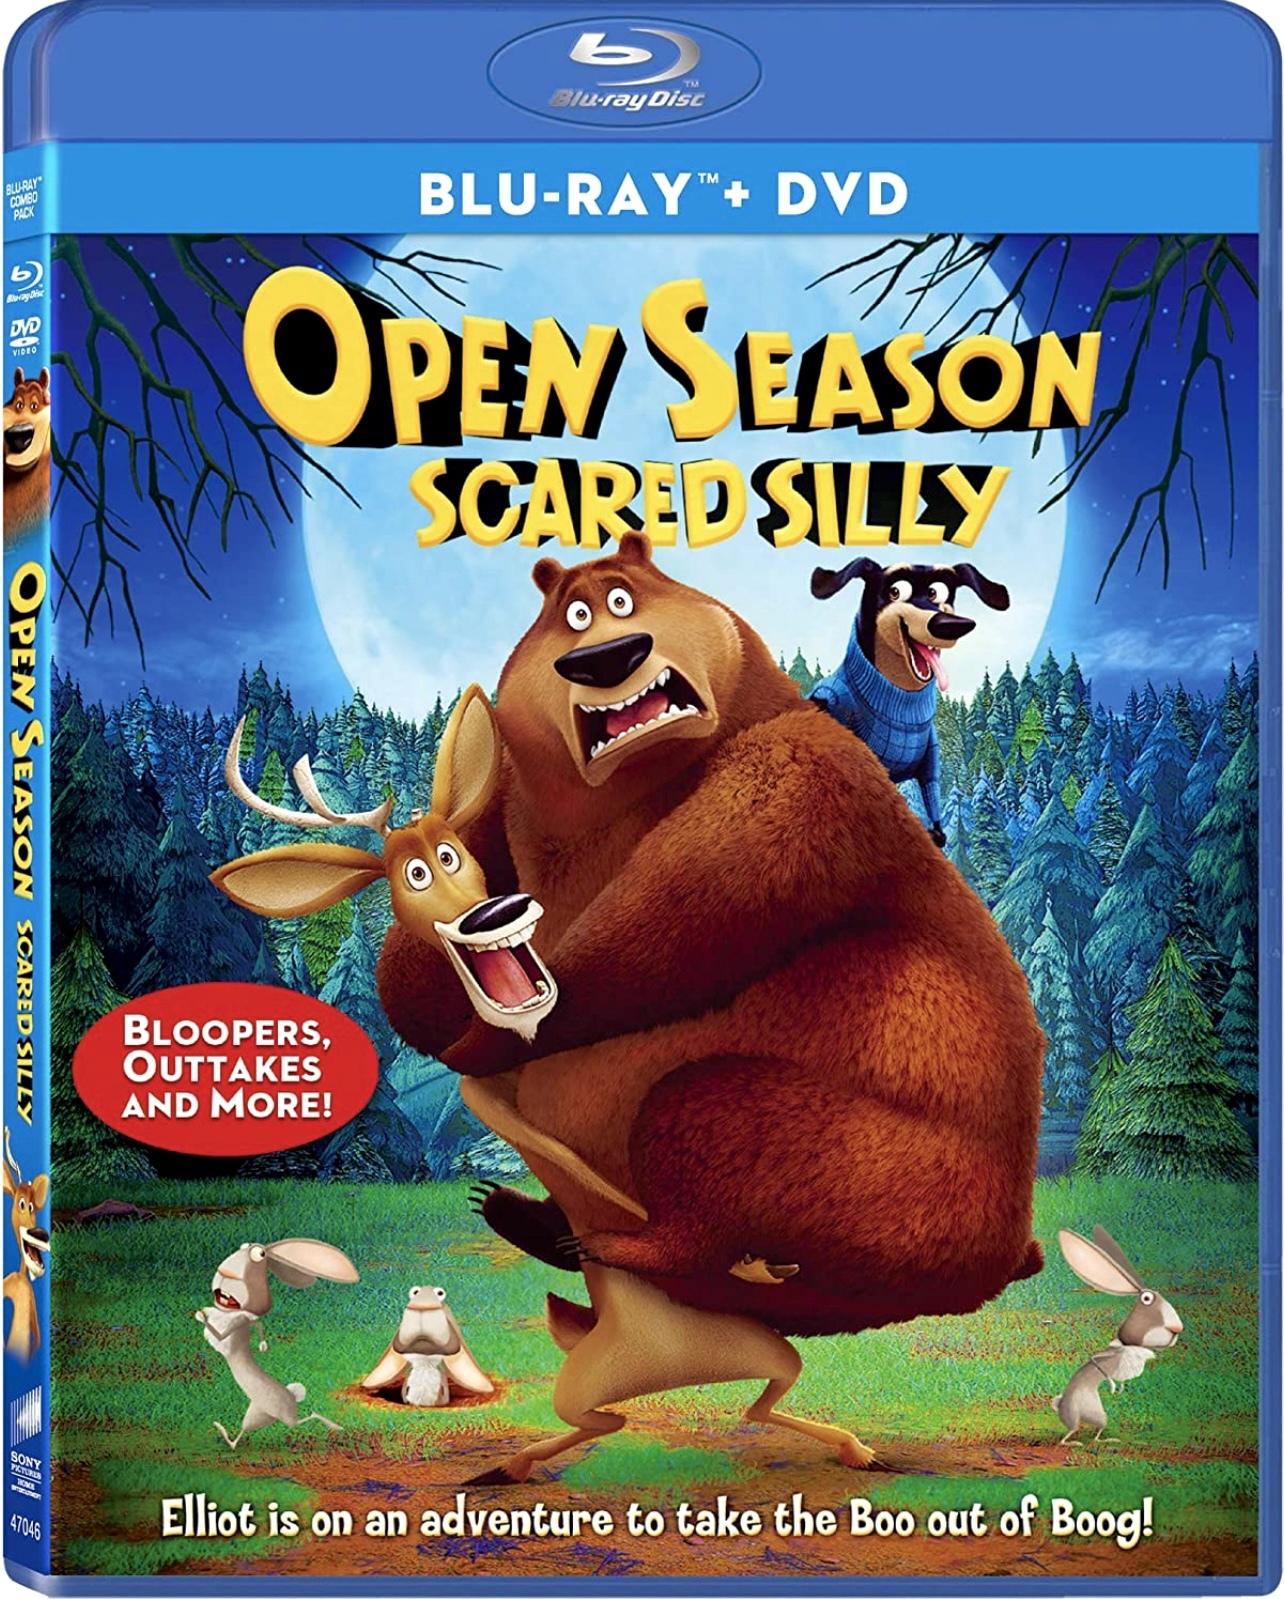 Open Season: Scared Silly (2016) Blu-ray